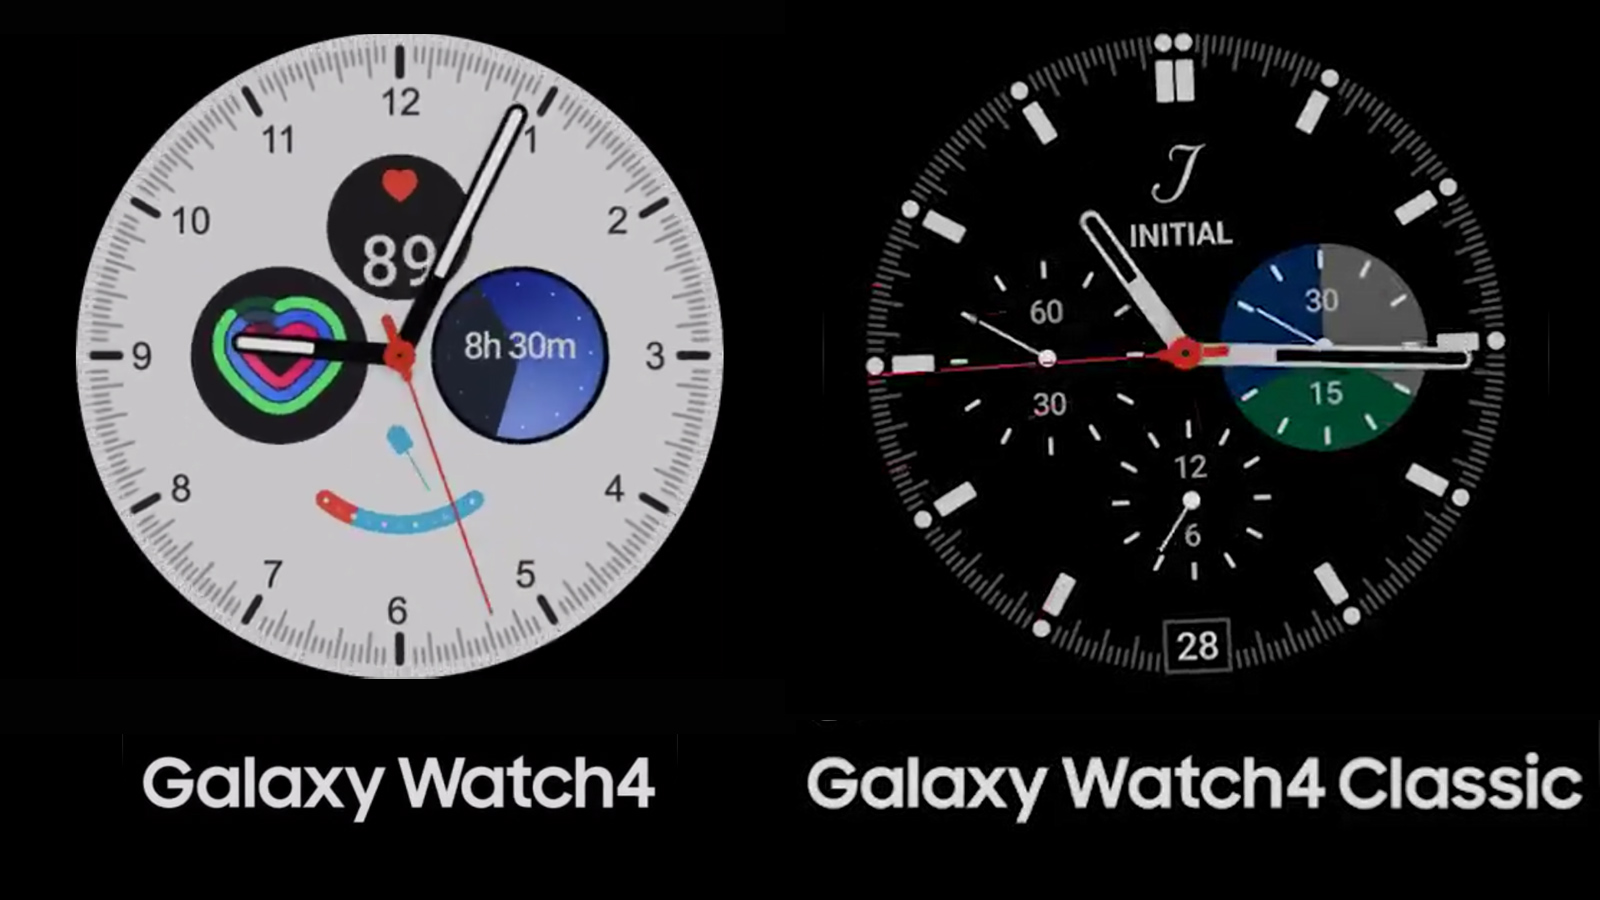 Samsung Galaxy Watch 4 And Classic Watch